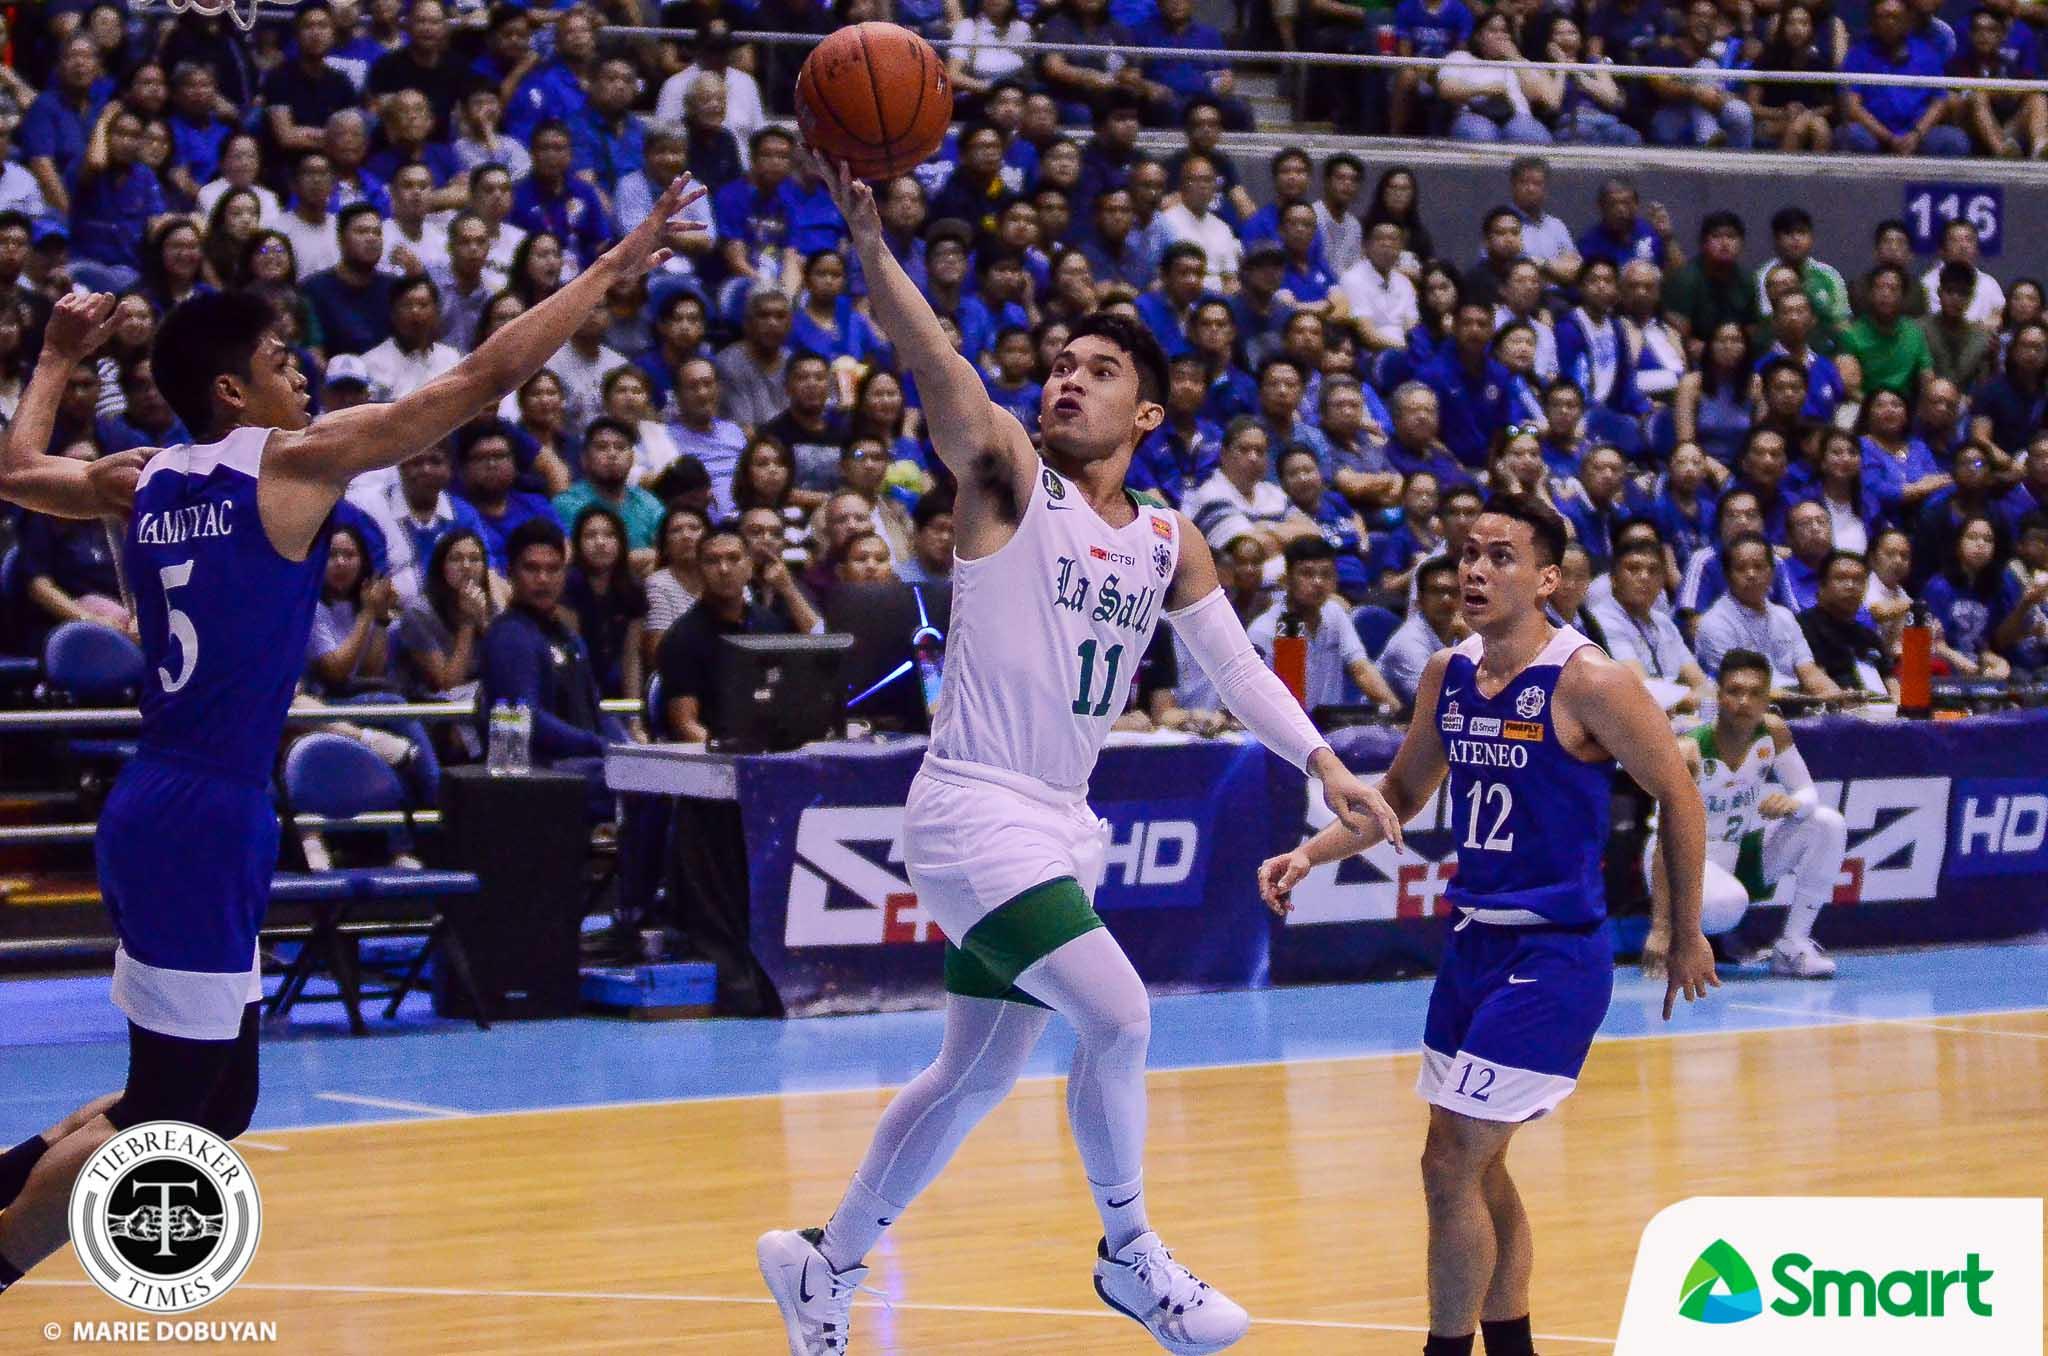 UAAP82-Mens-Basketball-ADMU-DLSU-Melecio-4241 Mac Cardona was more than just a scorer, says Derrick Pumaren Basketball DLSU News  - philippine sports news